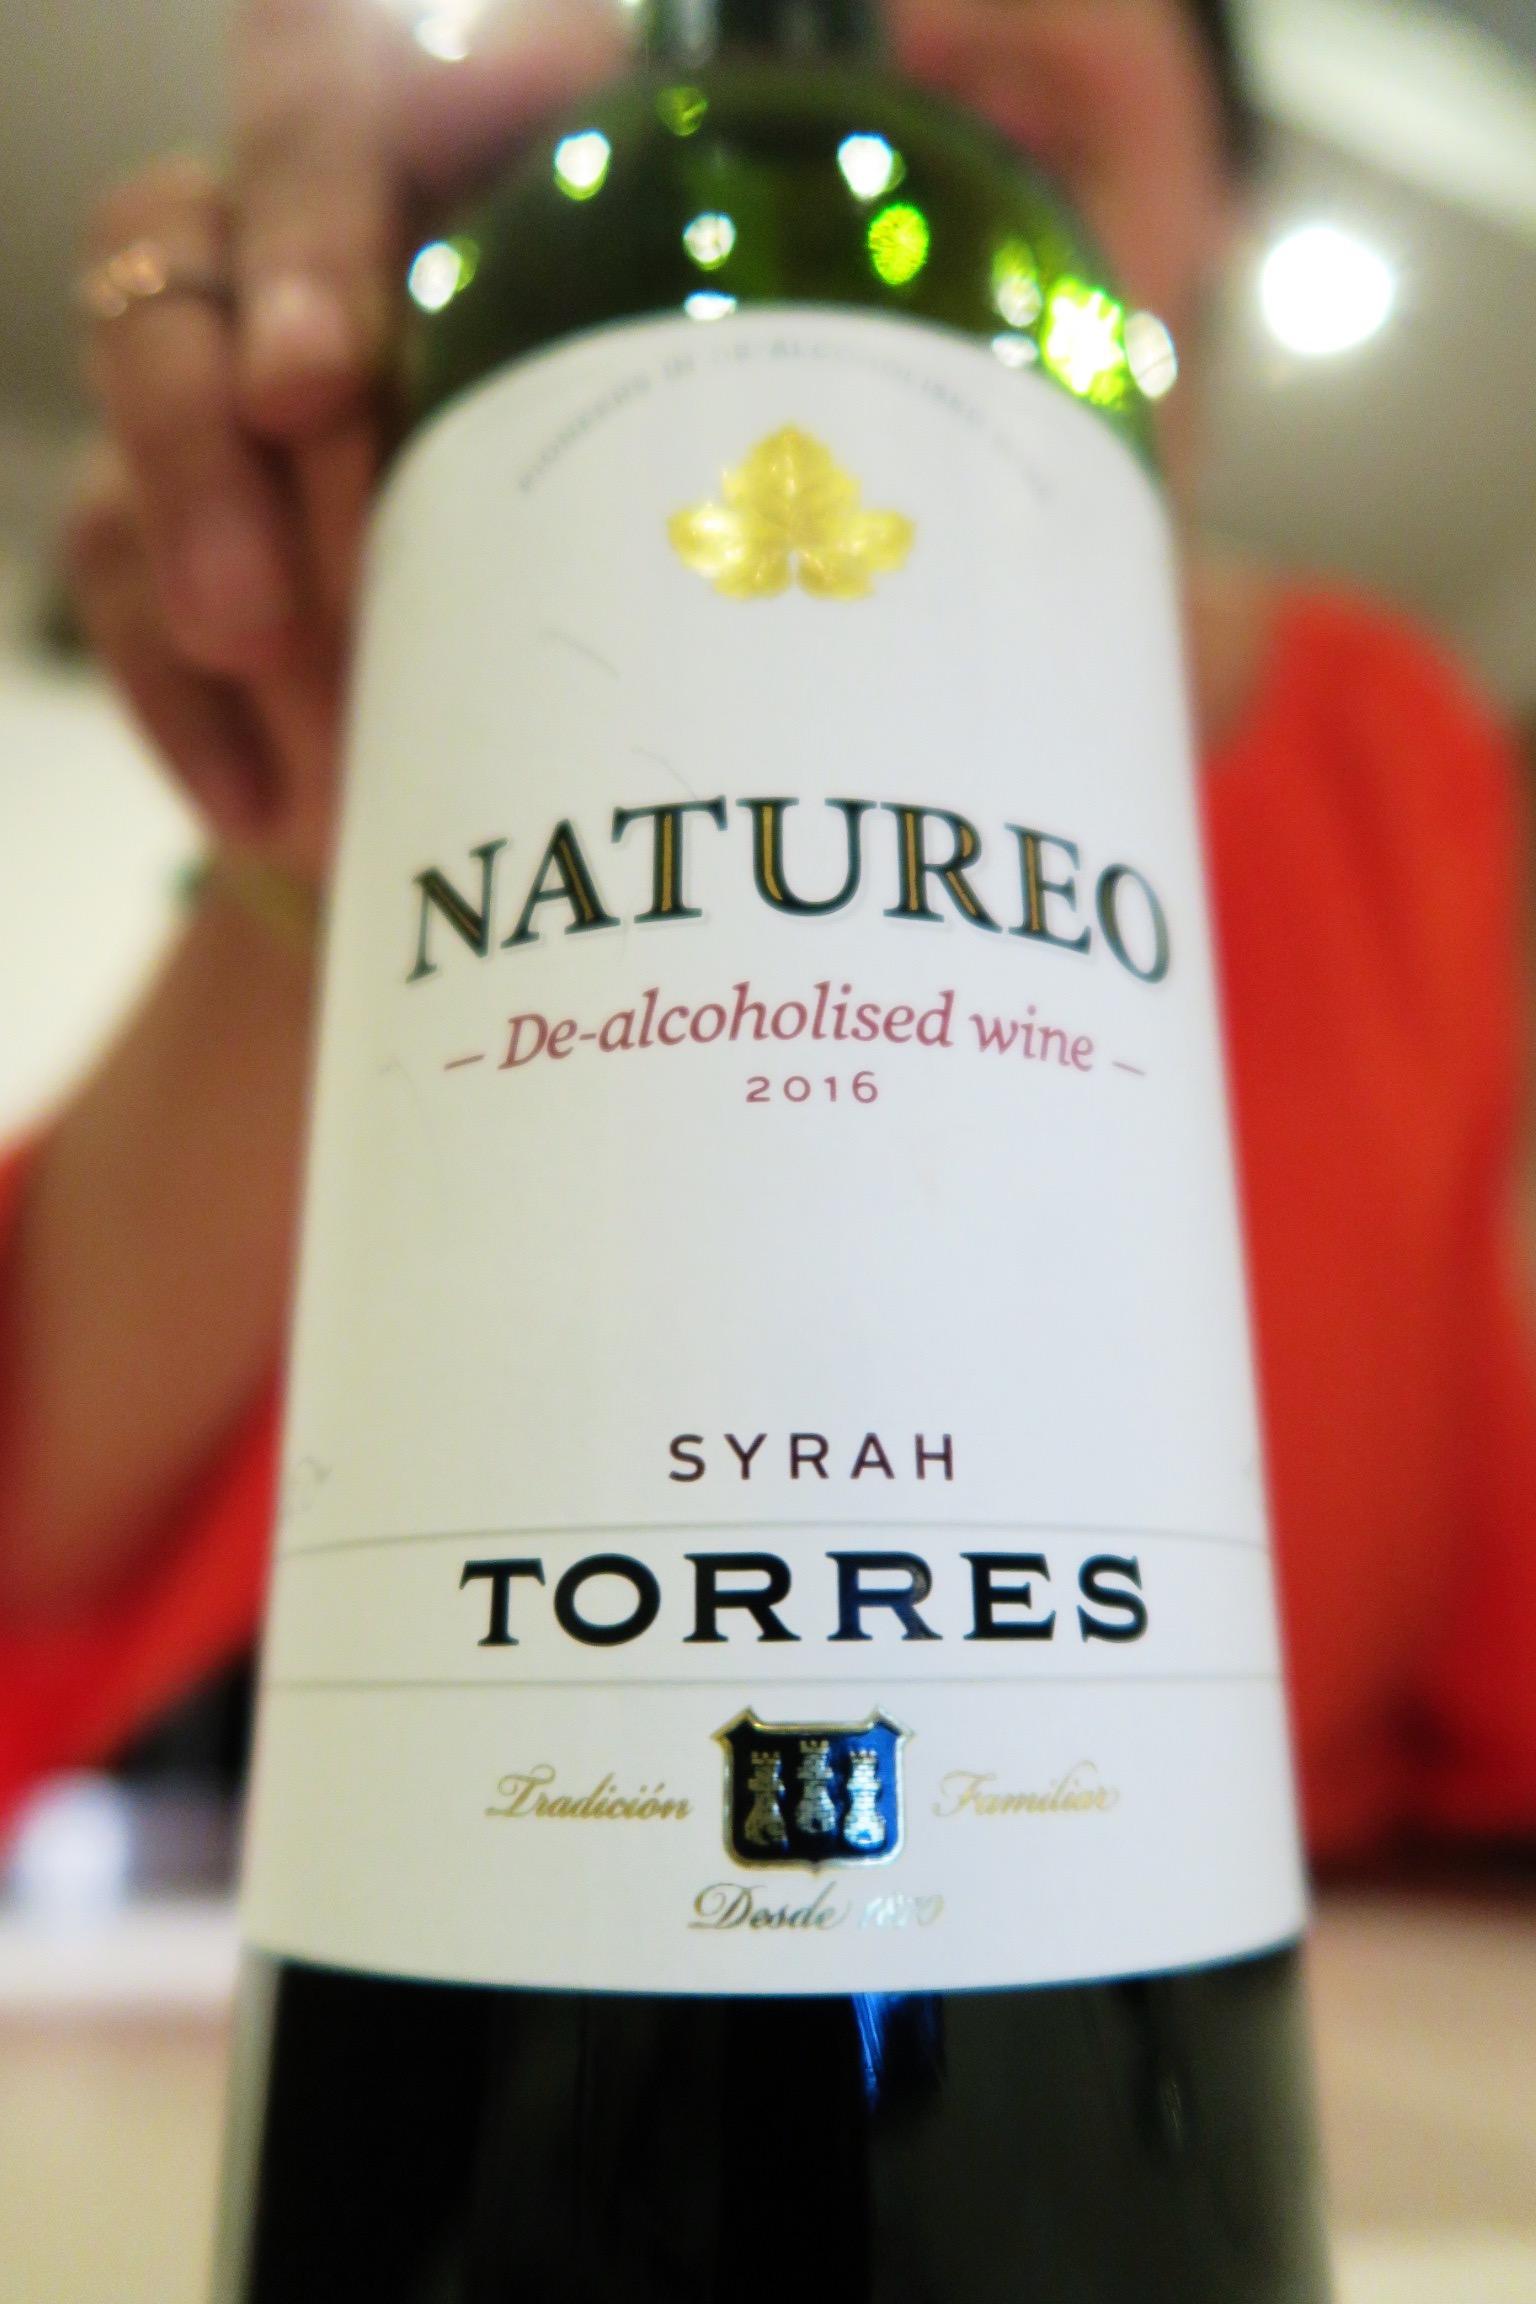 My 'red' of choice, Torres Natureo De-Alcoholised Syrah, £6.99 at Waitrose.